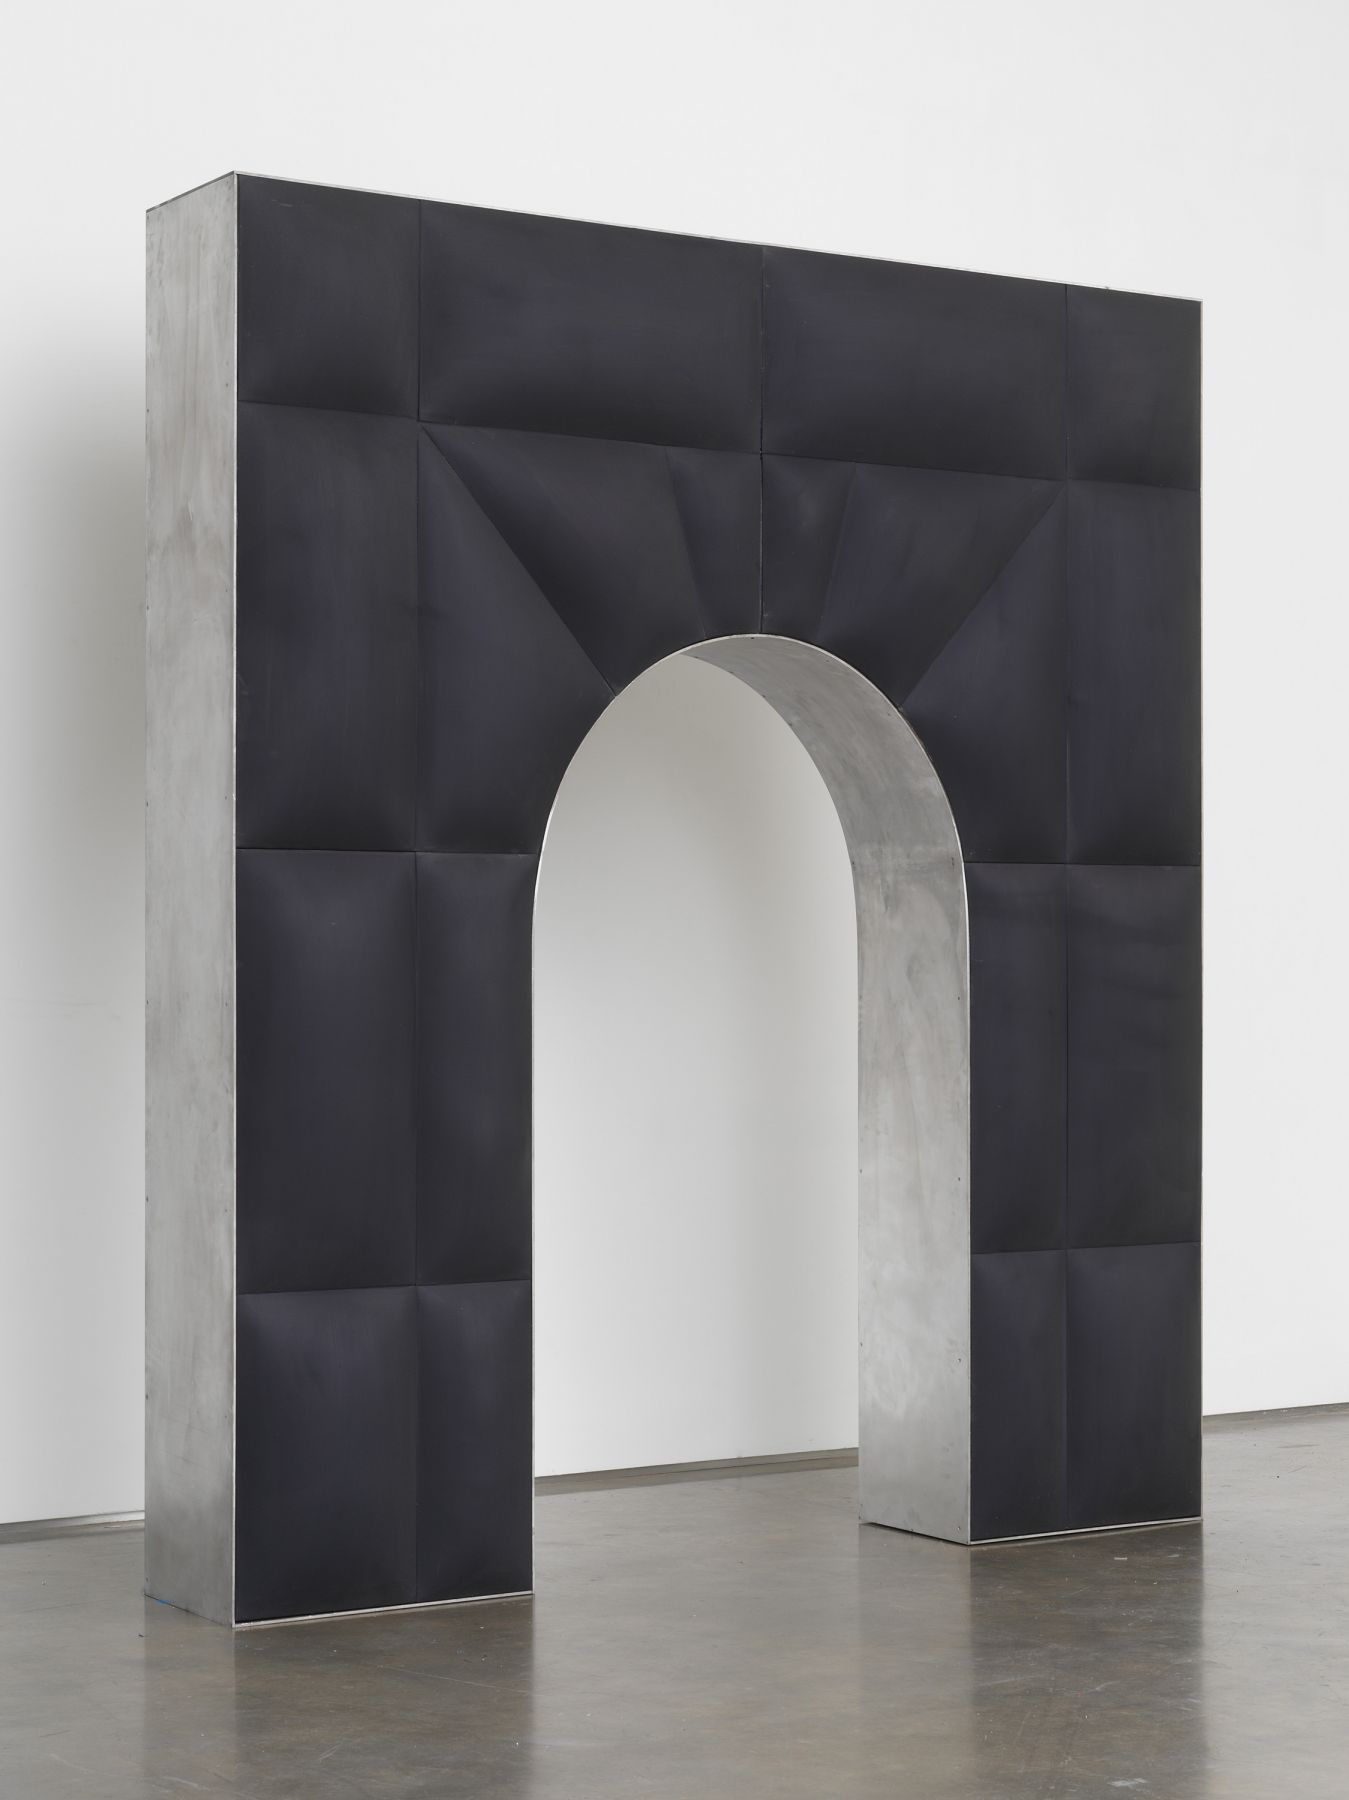 Untitled, 2017, Fiberglass-reinforced plaster and oil on cotton, wood, aluminum